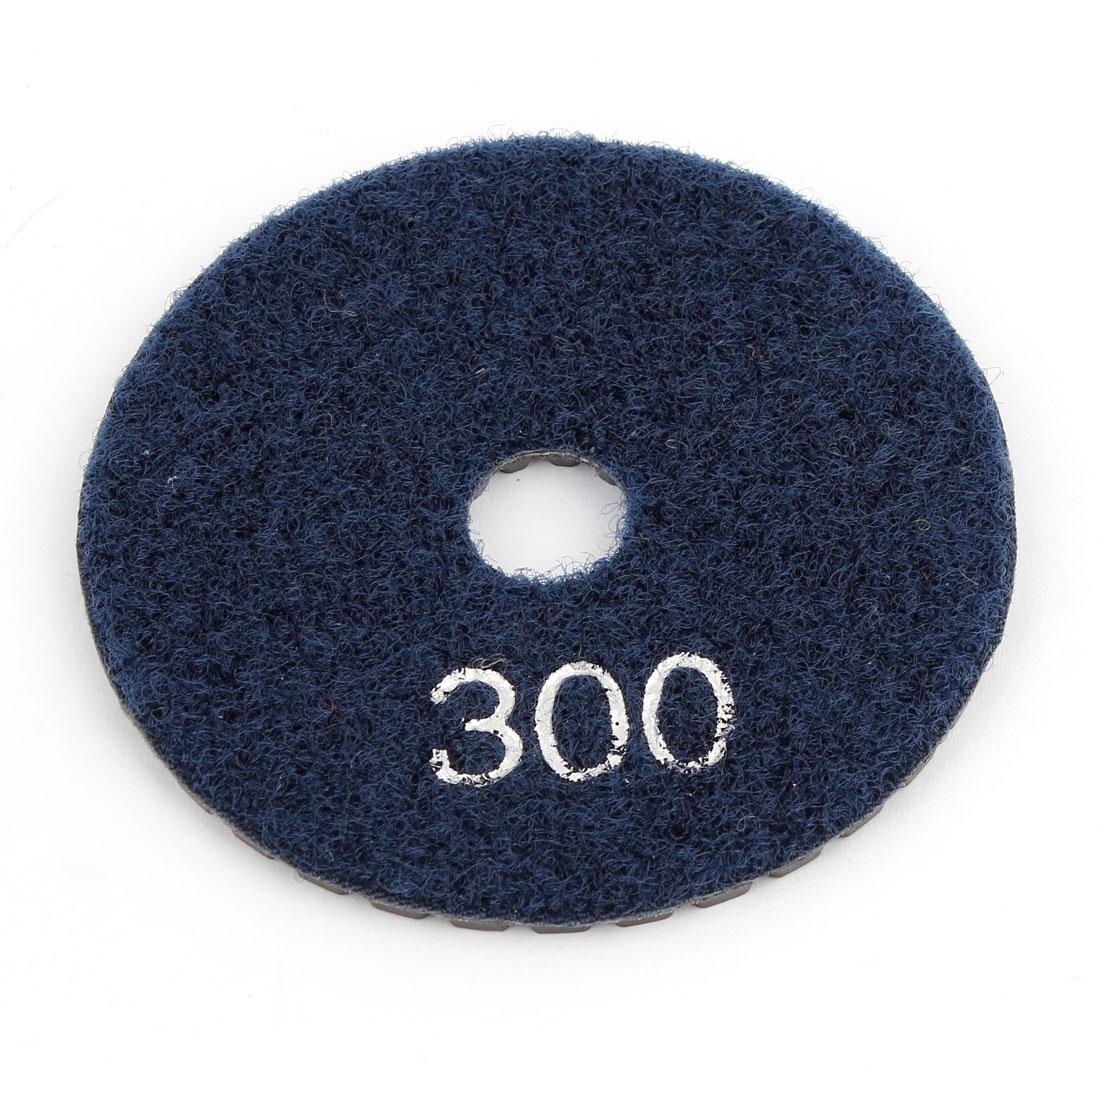 "Dark Blue Grit 300 3"" Diameter Tile Stone Polisher Grinder Diamond Polishing Pad"